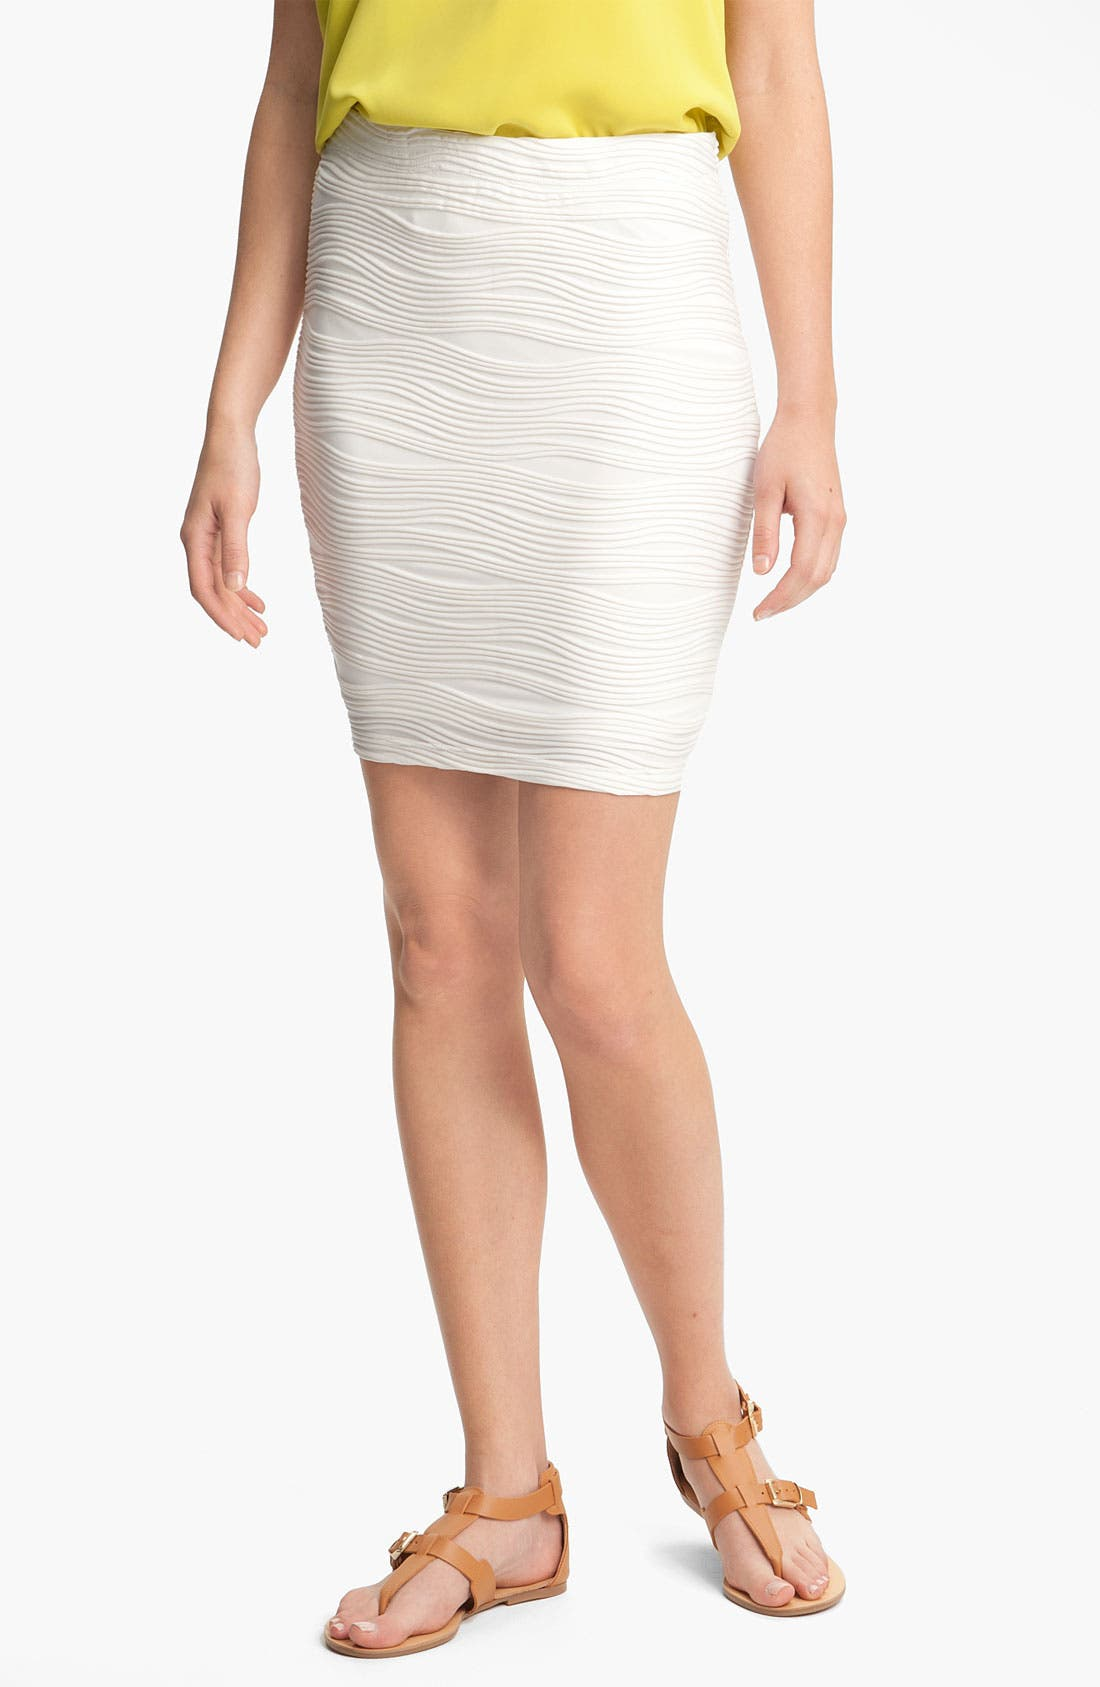 Main Image - Lily White Textured Bandage Skirt (Juniors)